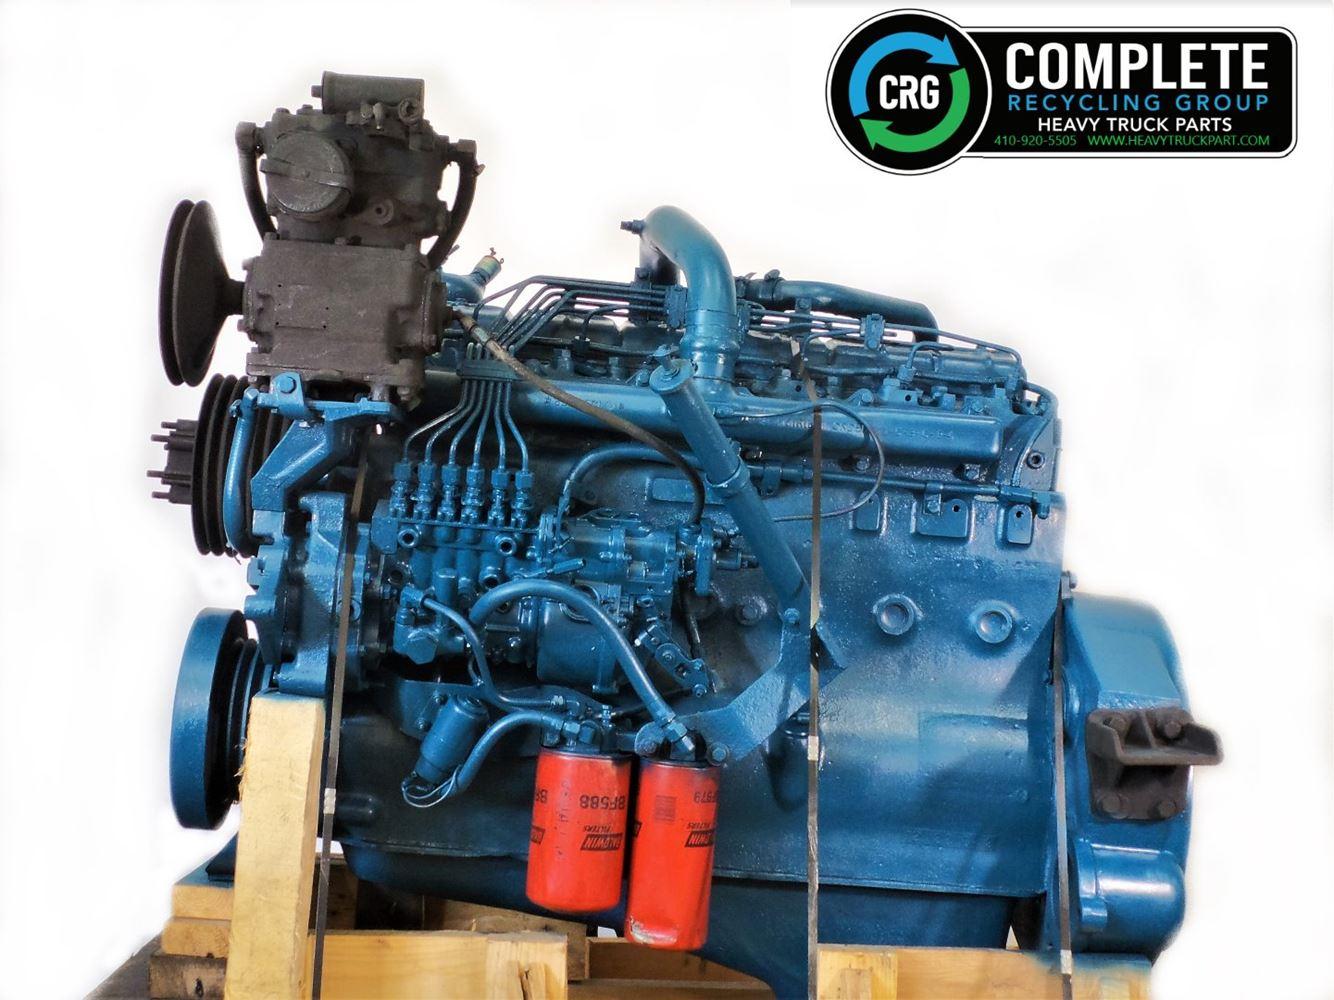 1981 INTERNATIONAL DT466 ENGINE ASSEMBLY TRUCK PARTS #680055